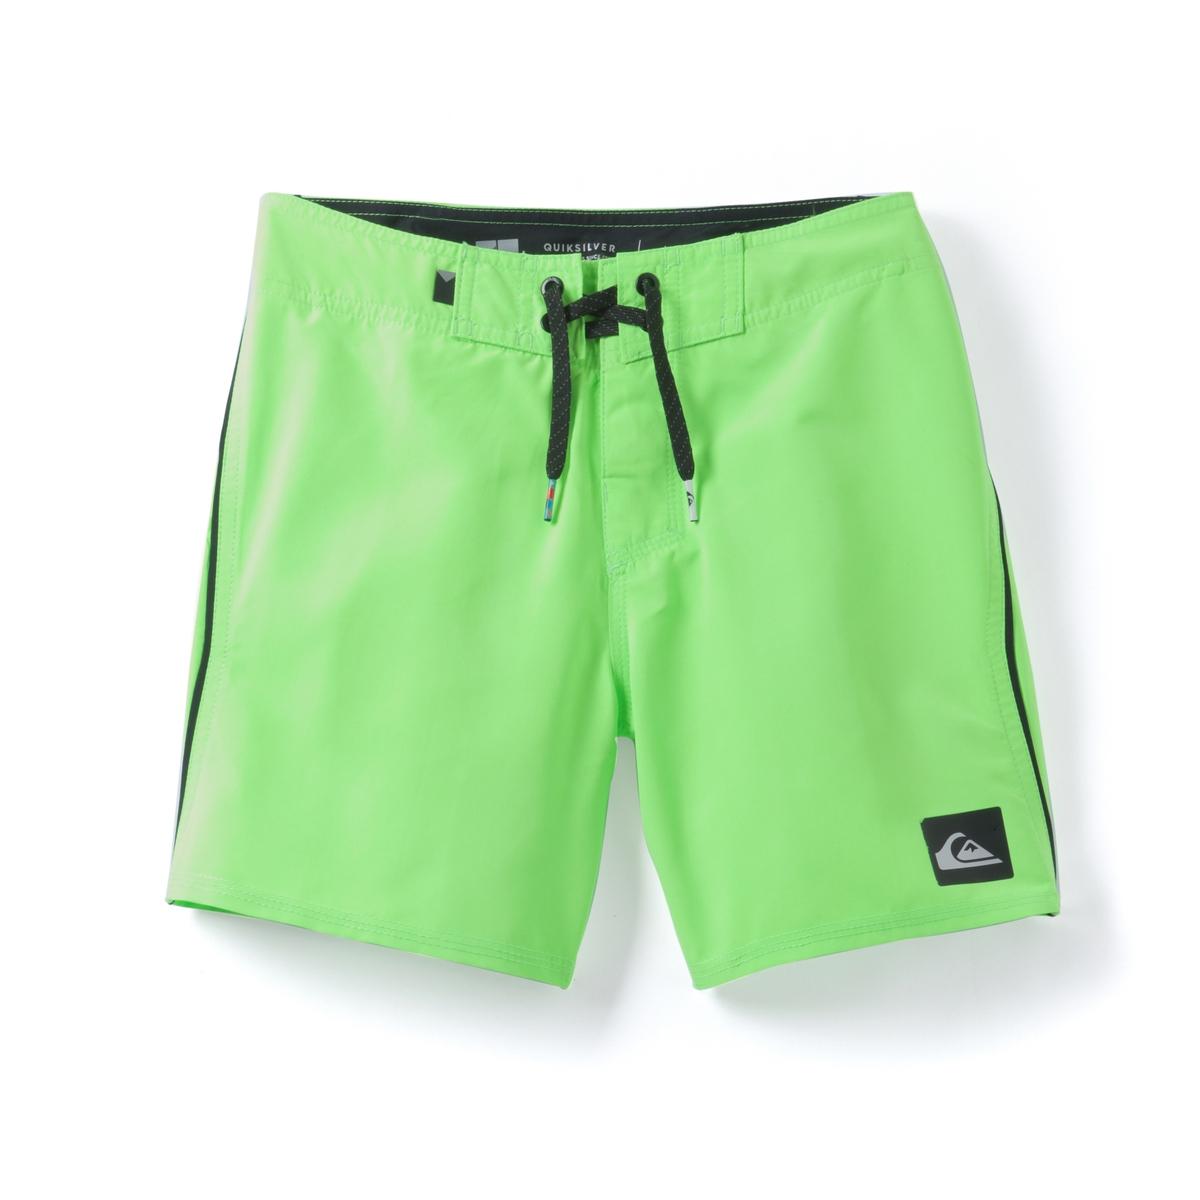 Шорты пляжные двухцветные 8 - 16 лет Quiksilver® шорты пляжные детские quiksilver hightechyth16 real teal